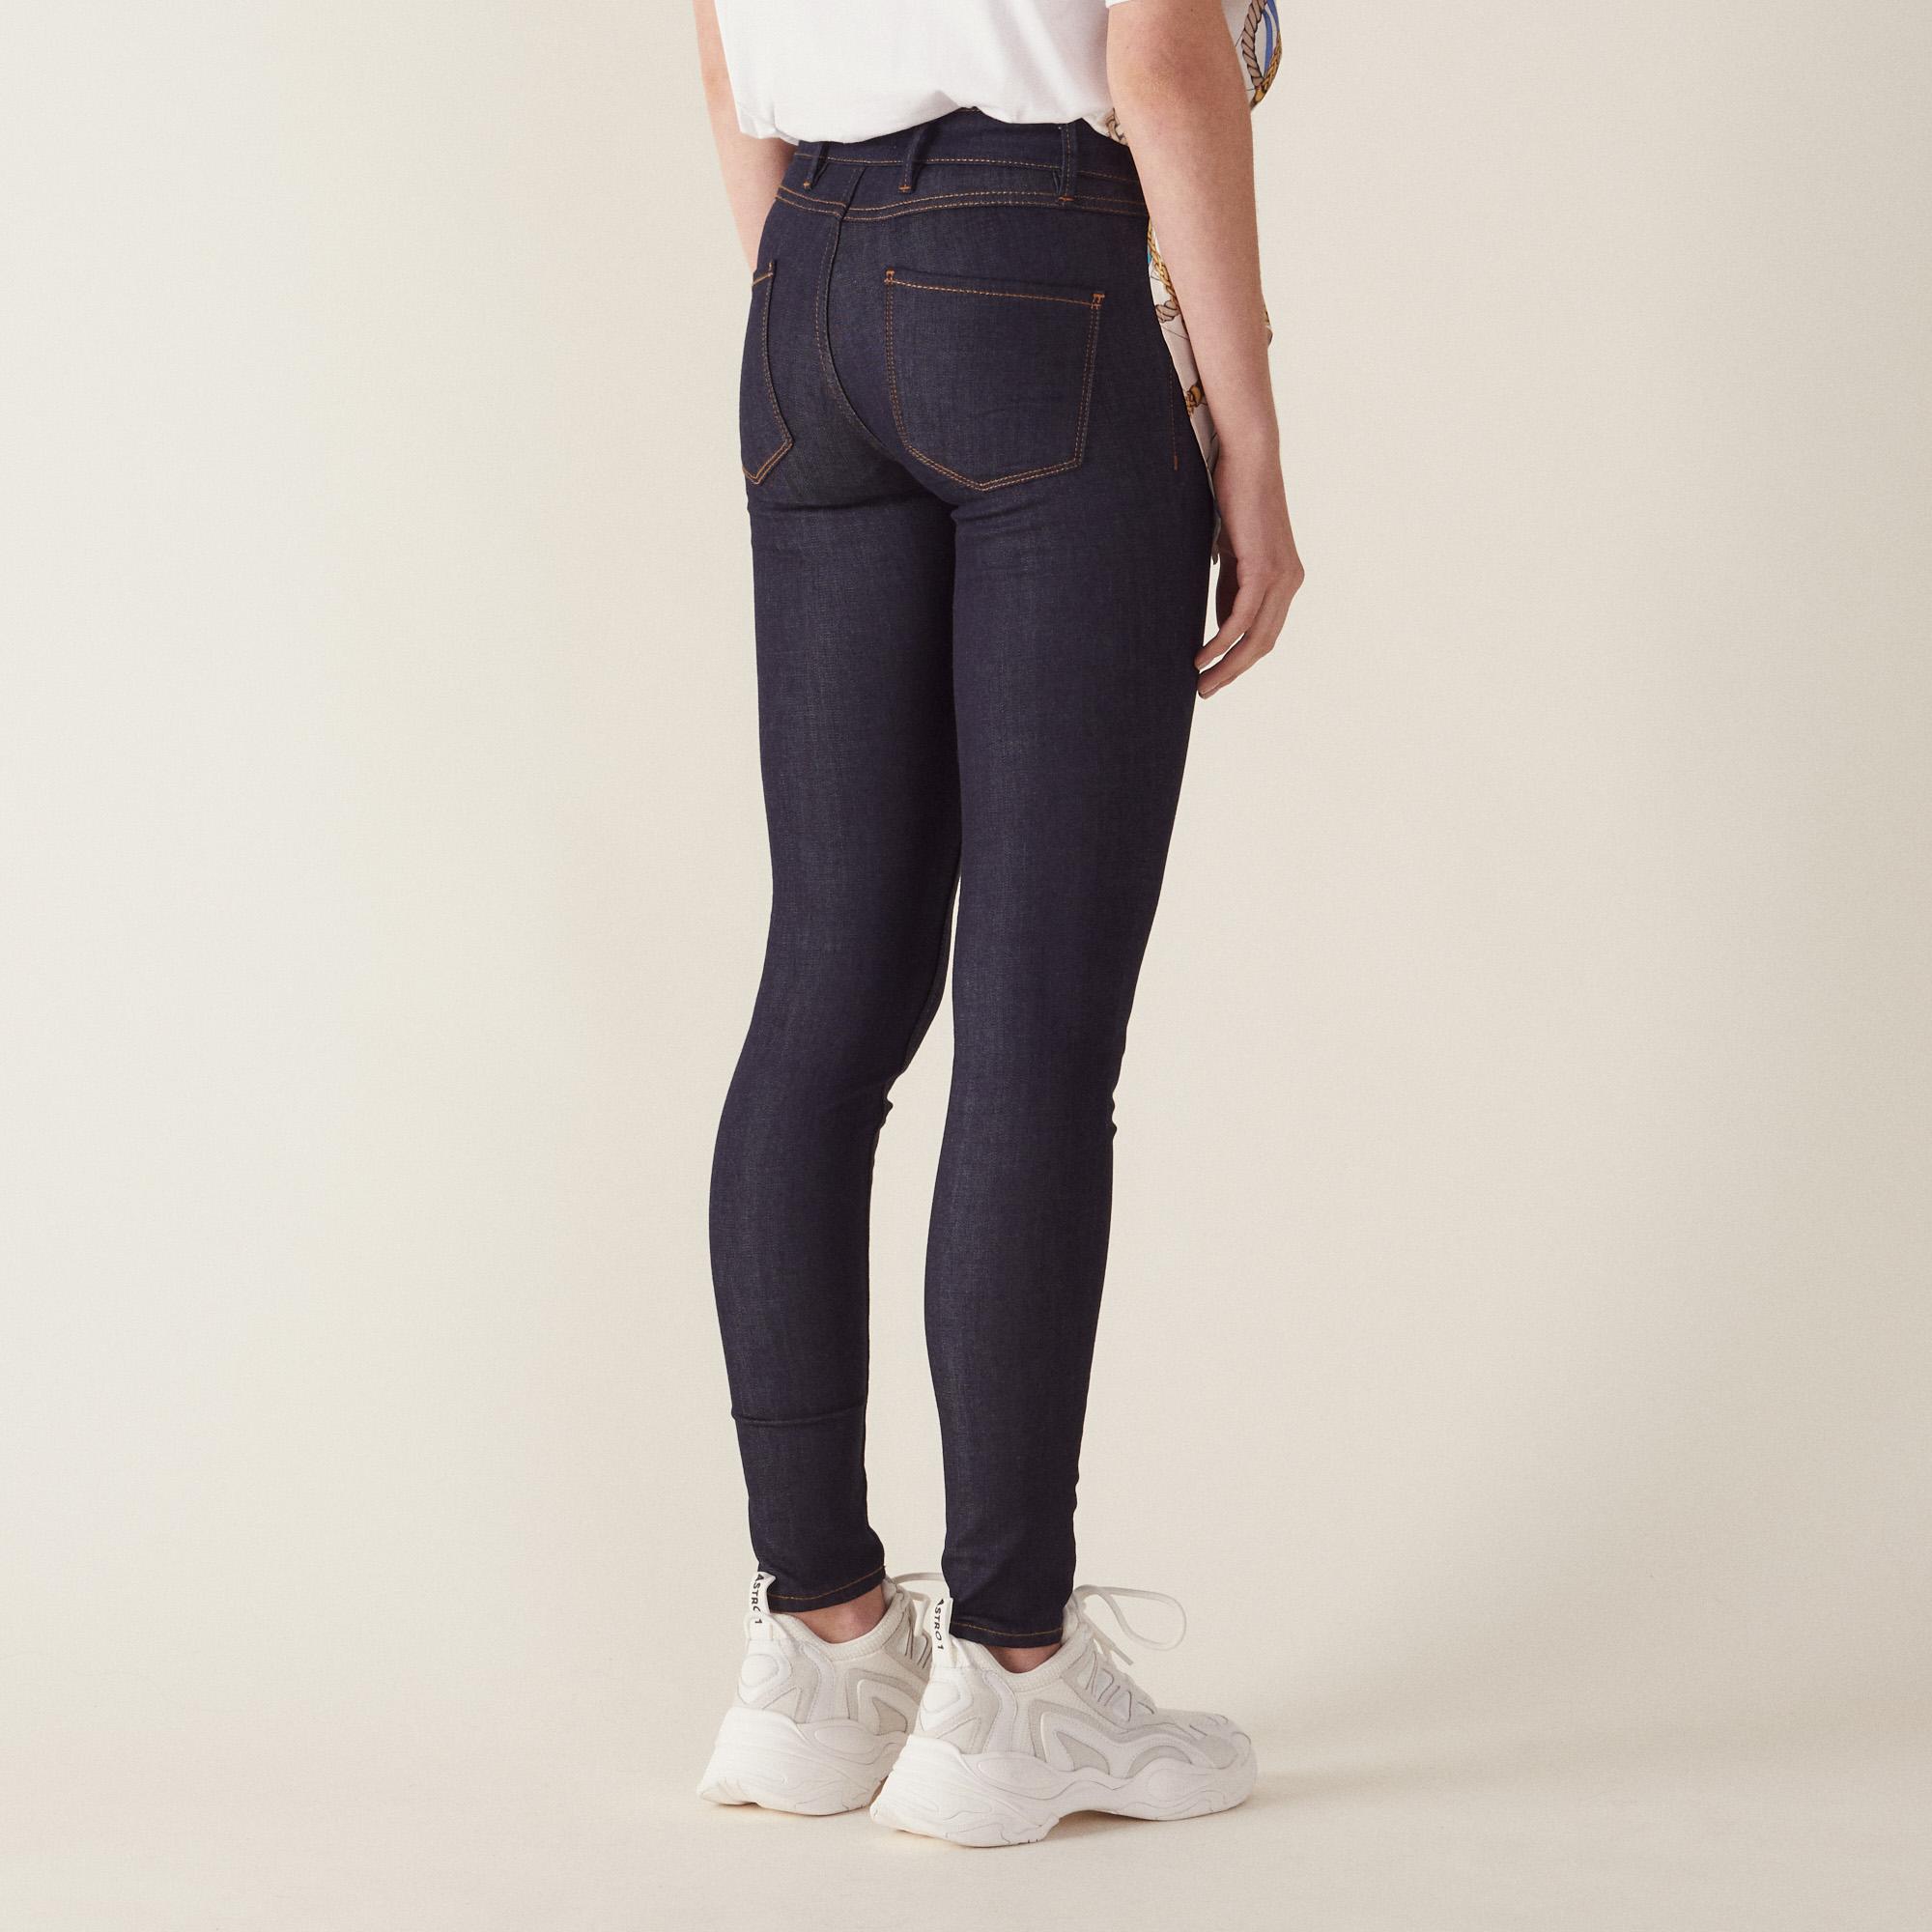 Raw Denim Skinny Jeans Jeans Sandro Paris